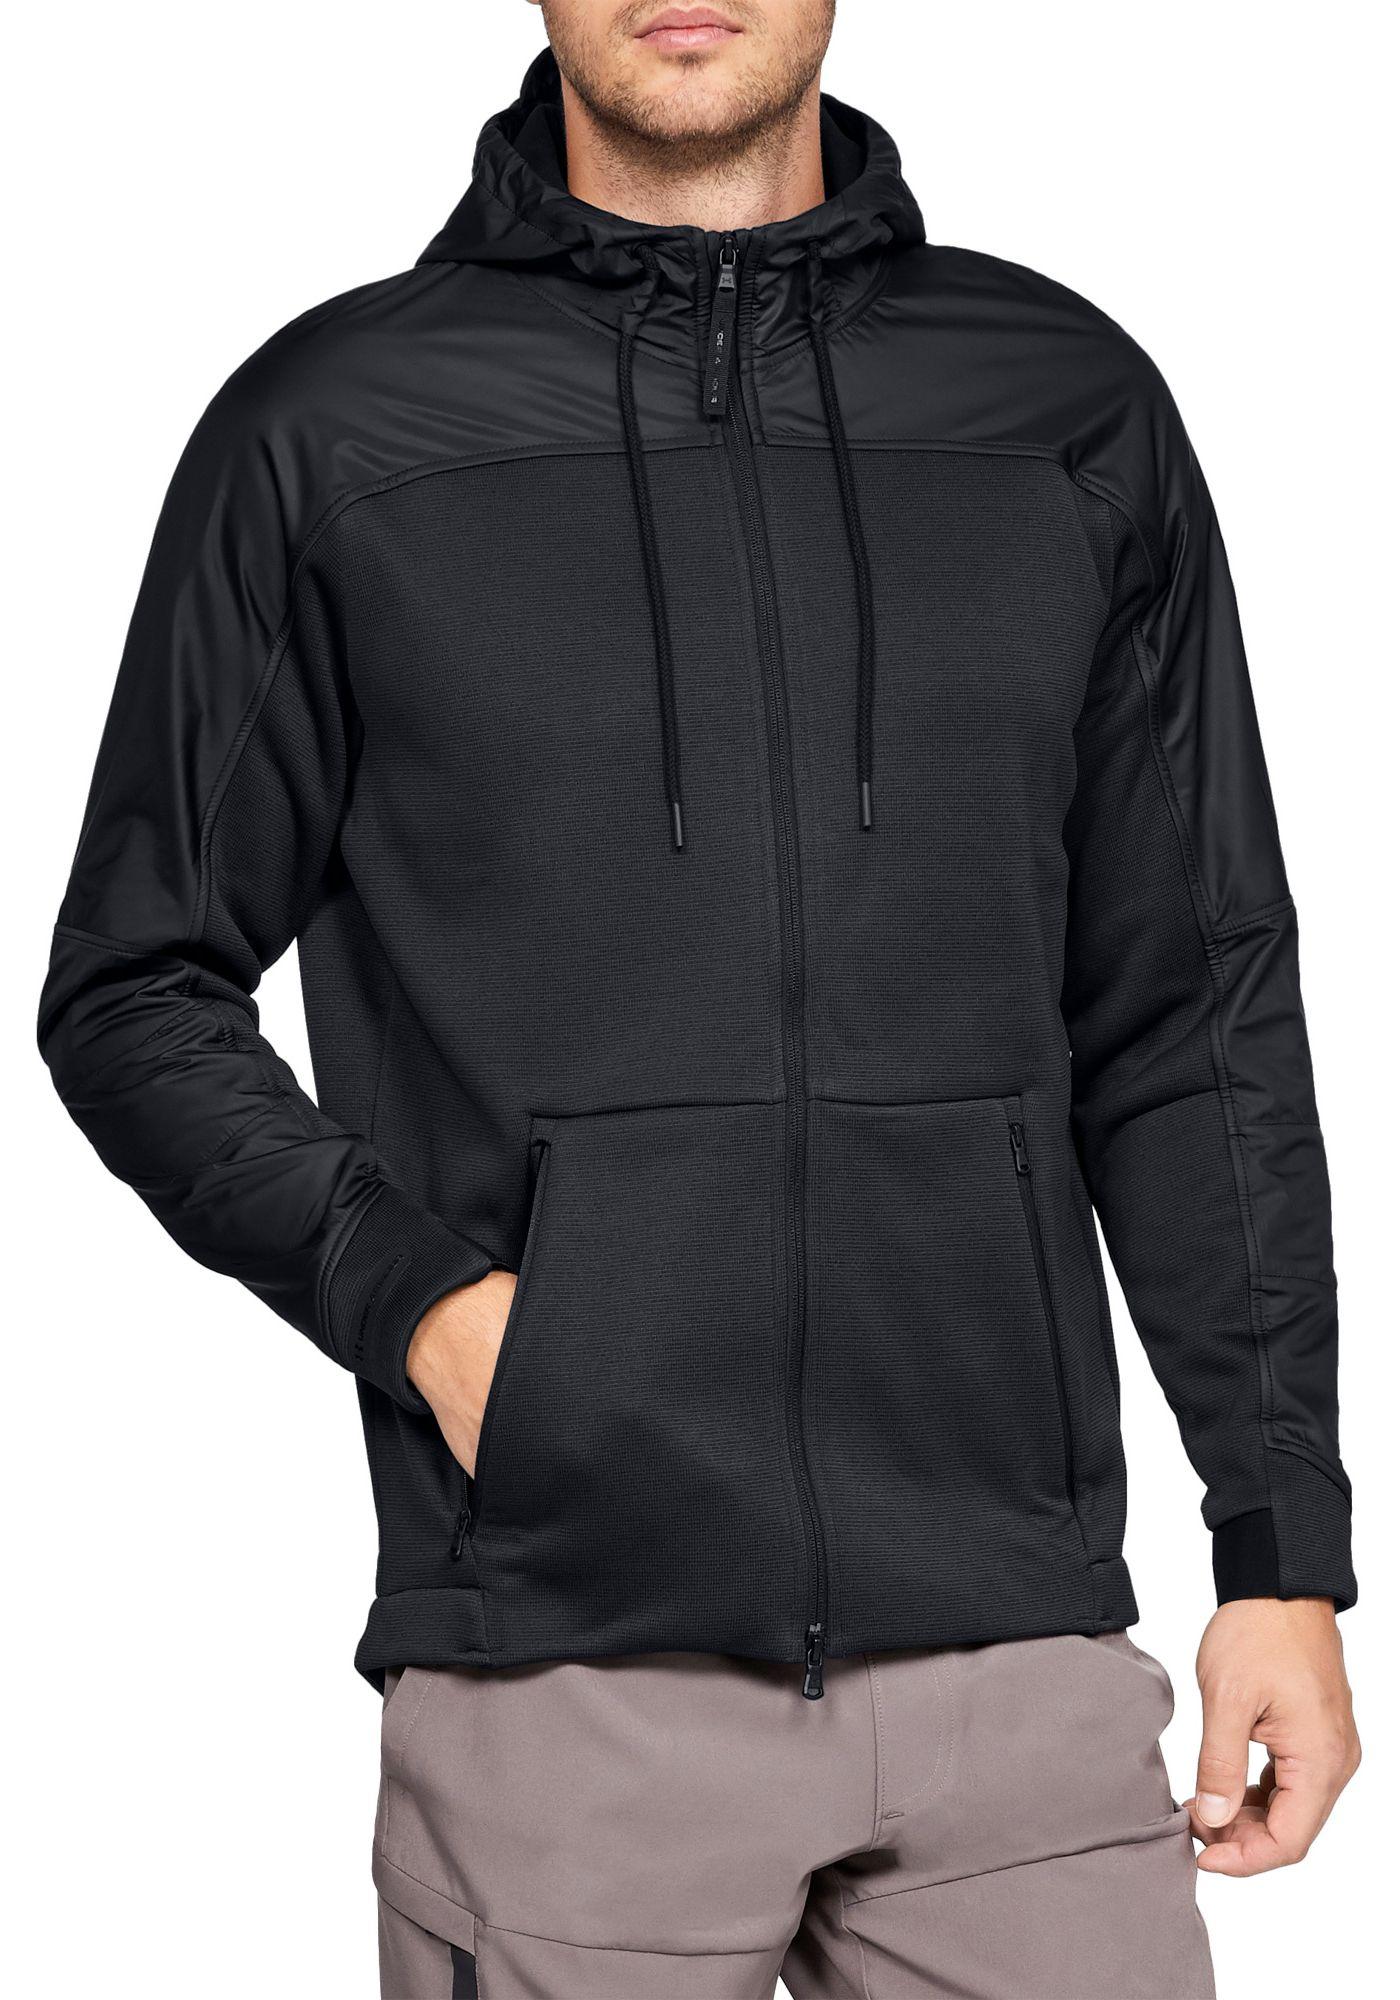 Under Armour Men's ColdGear Swacket Jacket (Regular and Big & Tall)